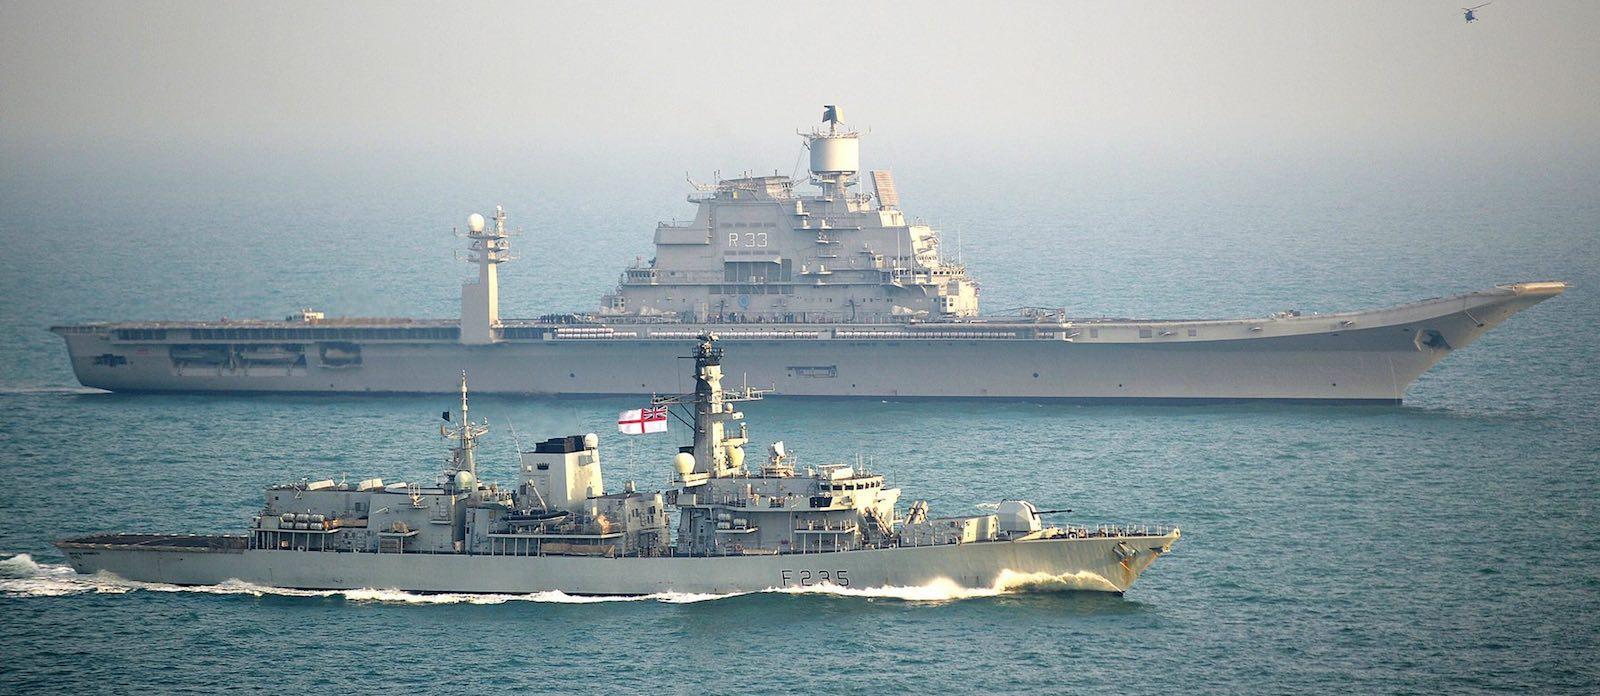 INS Vikramaditya with British Royal Navy frigate HMS Monmouth (Photo: Ministry of Defence, UK)